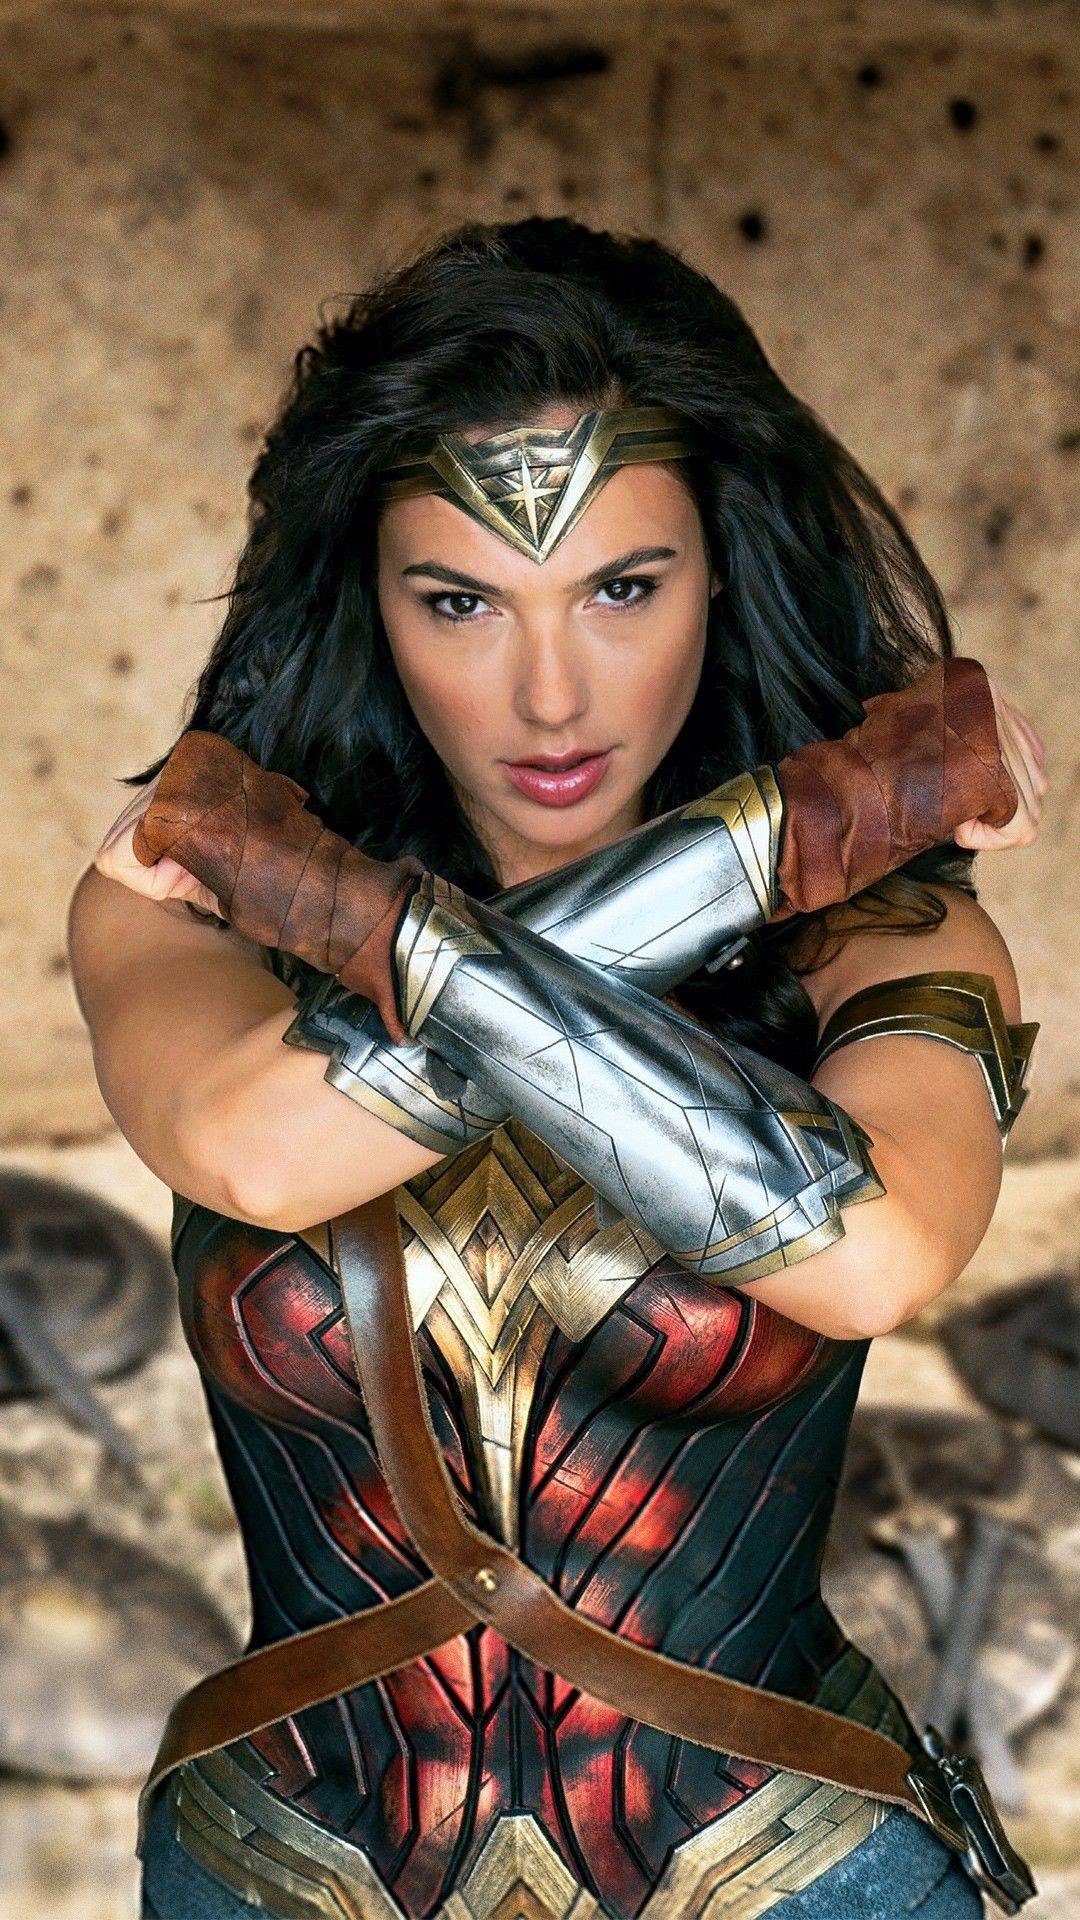 iPhone X Wallpaper Wonder Woman Gal gadot wonder woman Wonder 1080x1920